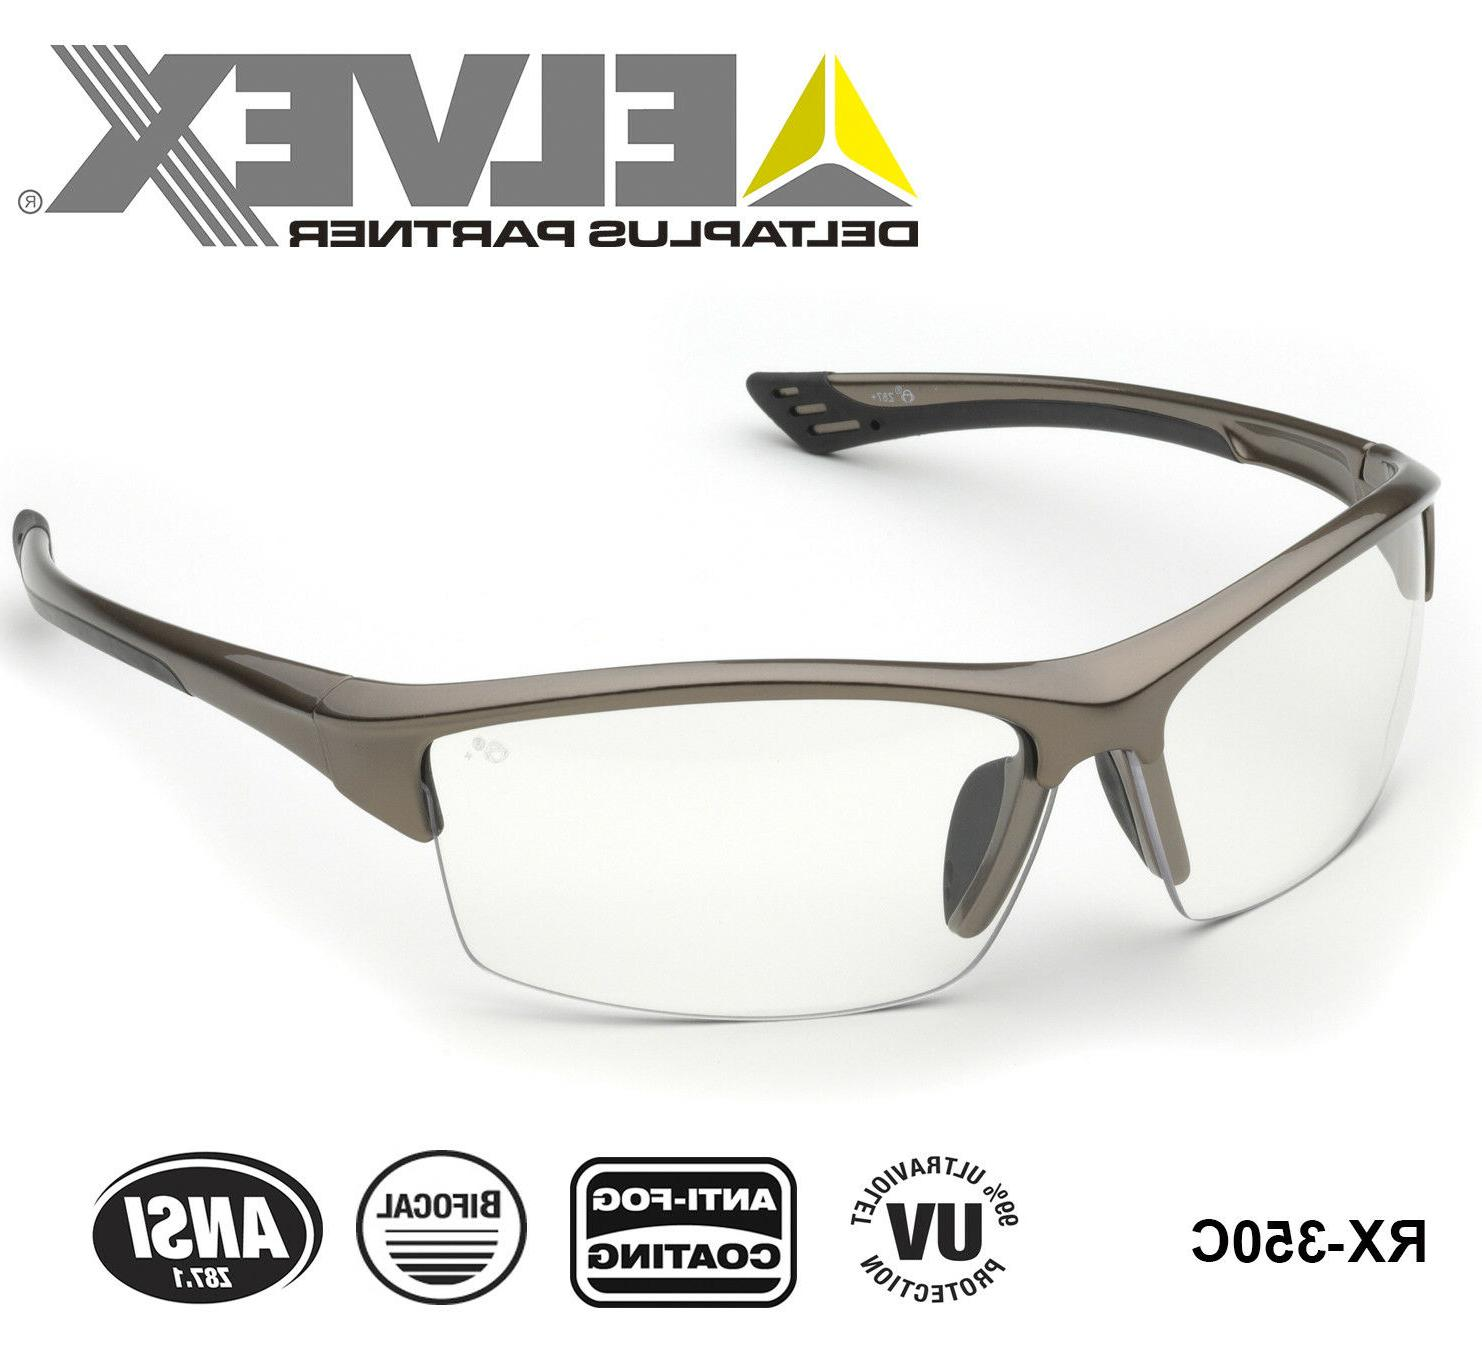 welrx350c10 rx 350c 1 0